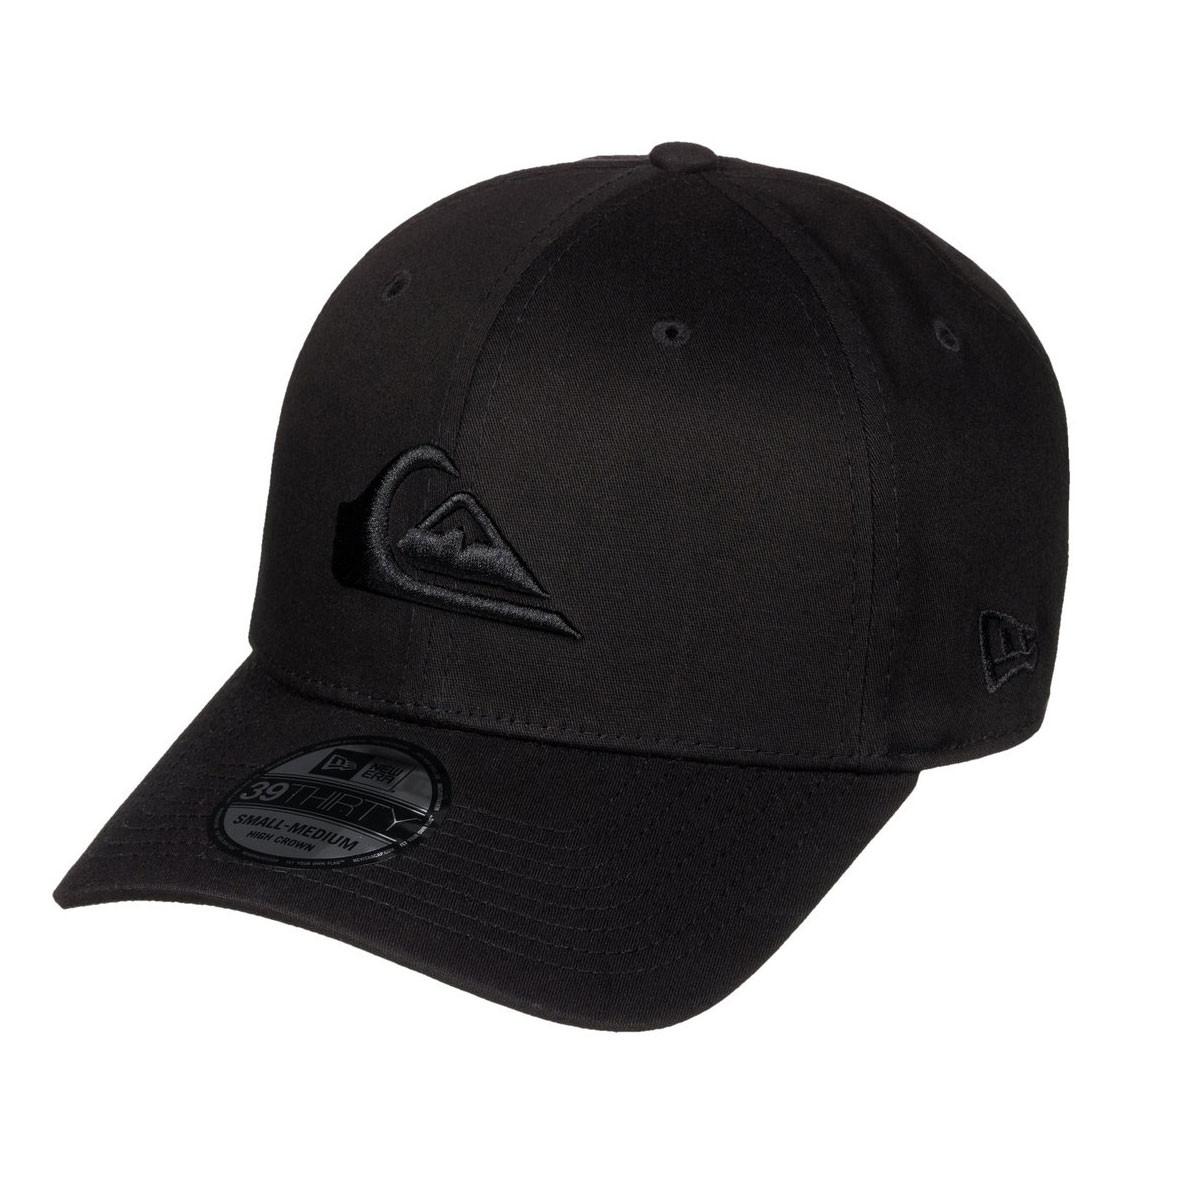 Kšiltovka Quiksilver Mountain & Wave Black black